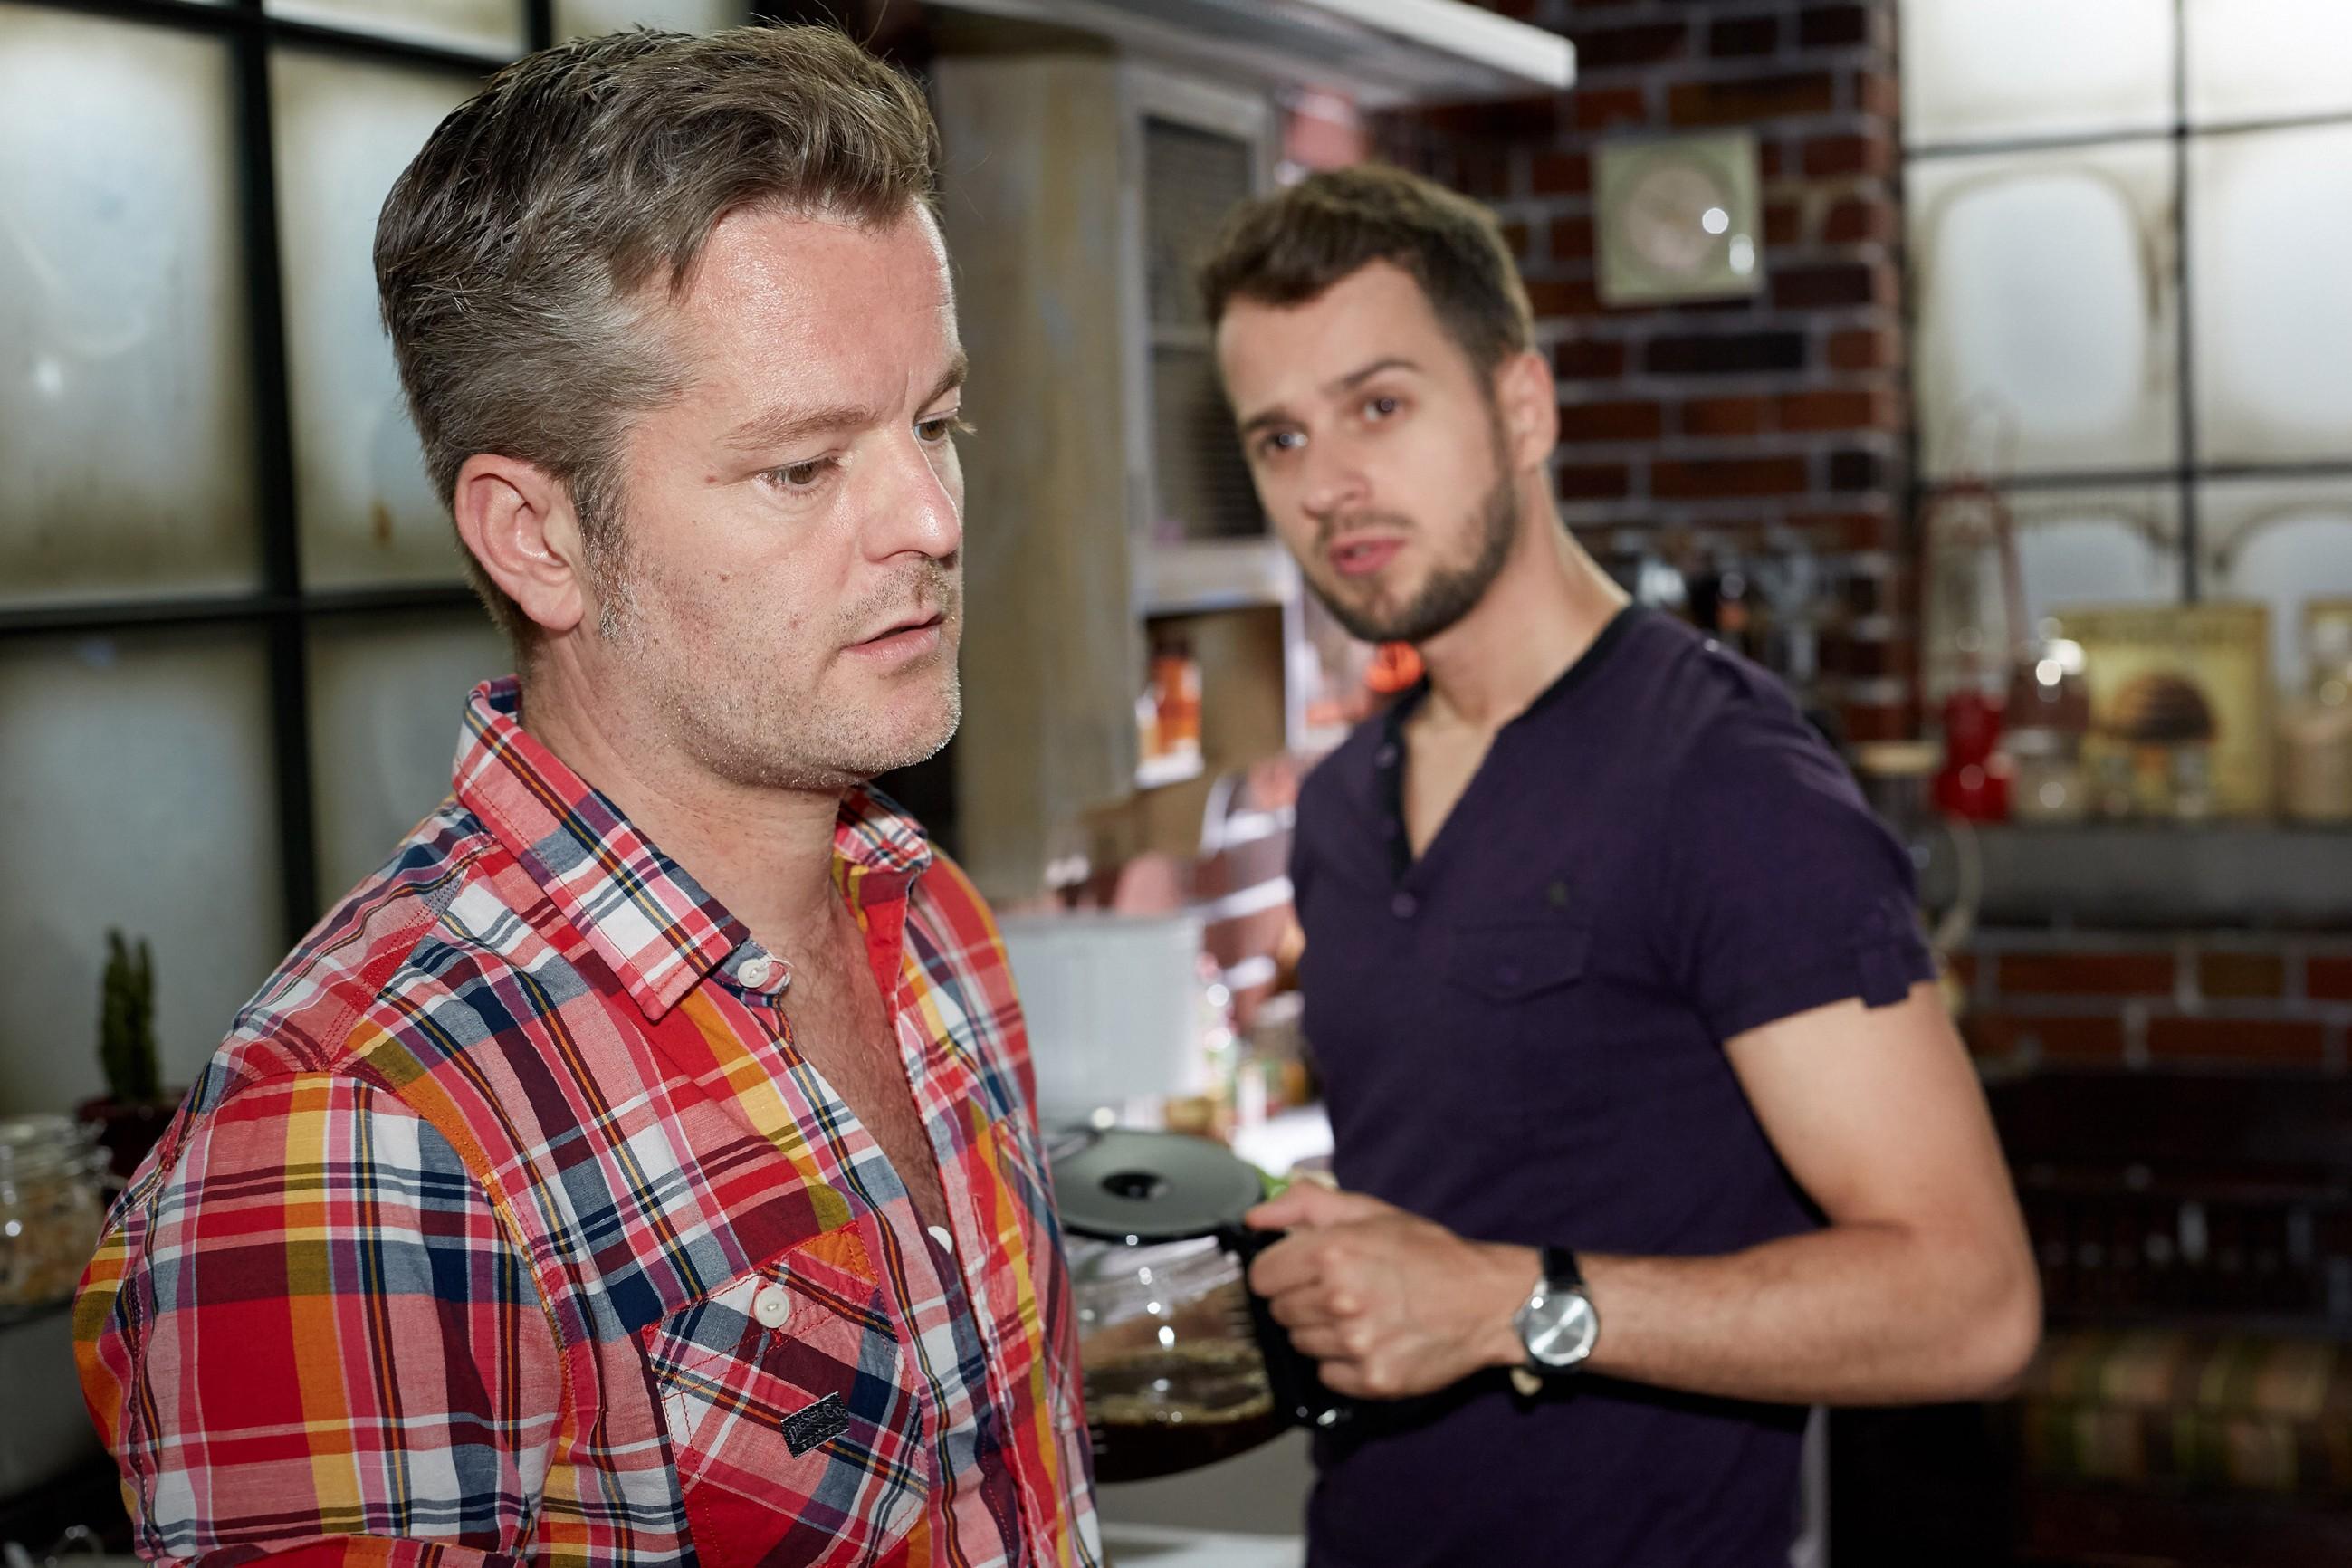 Tobi (Michael Jassin, r.) appelliert an Ingo (André Dietz), einen Neuanfang mit Diana zu wagen. (Quelle: RTL / Guido Engels)